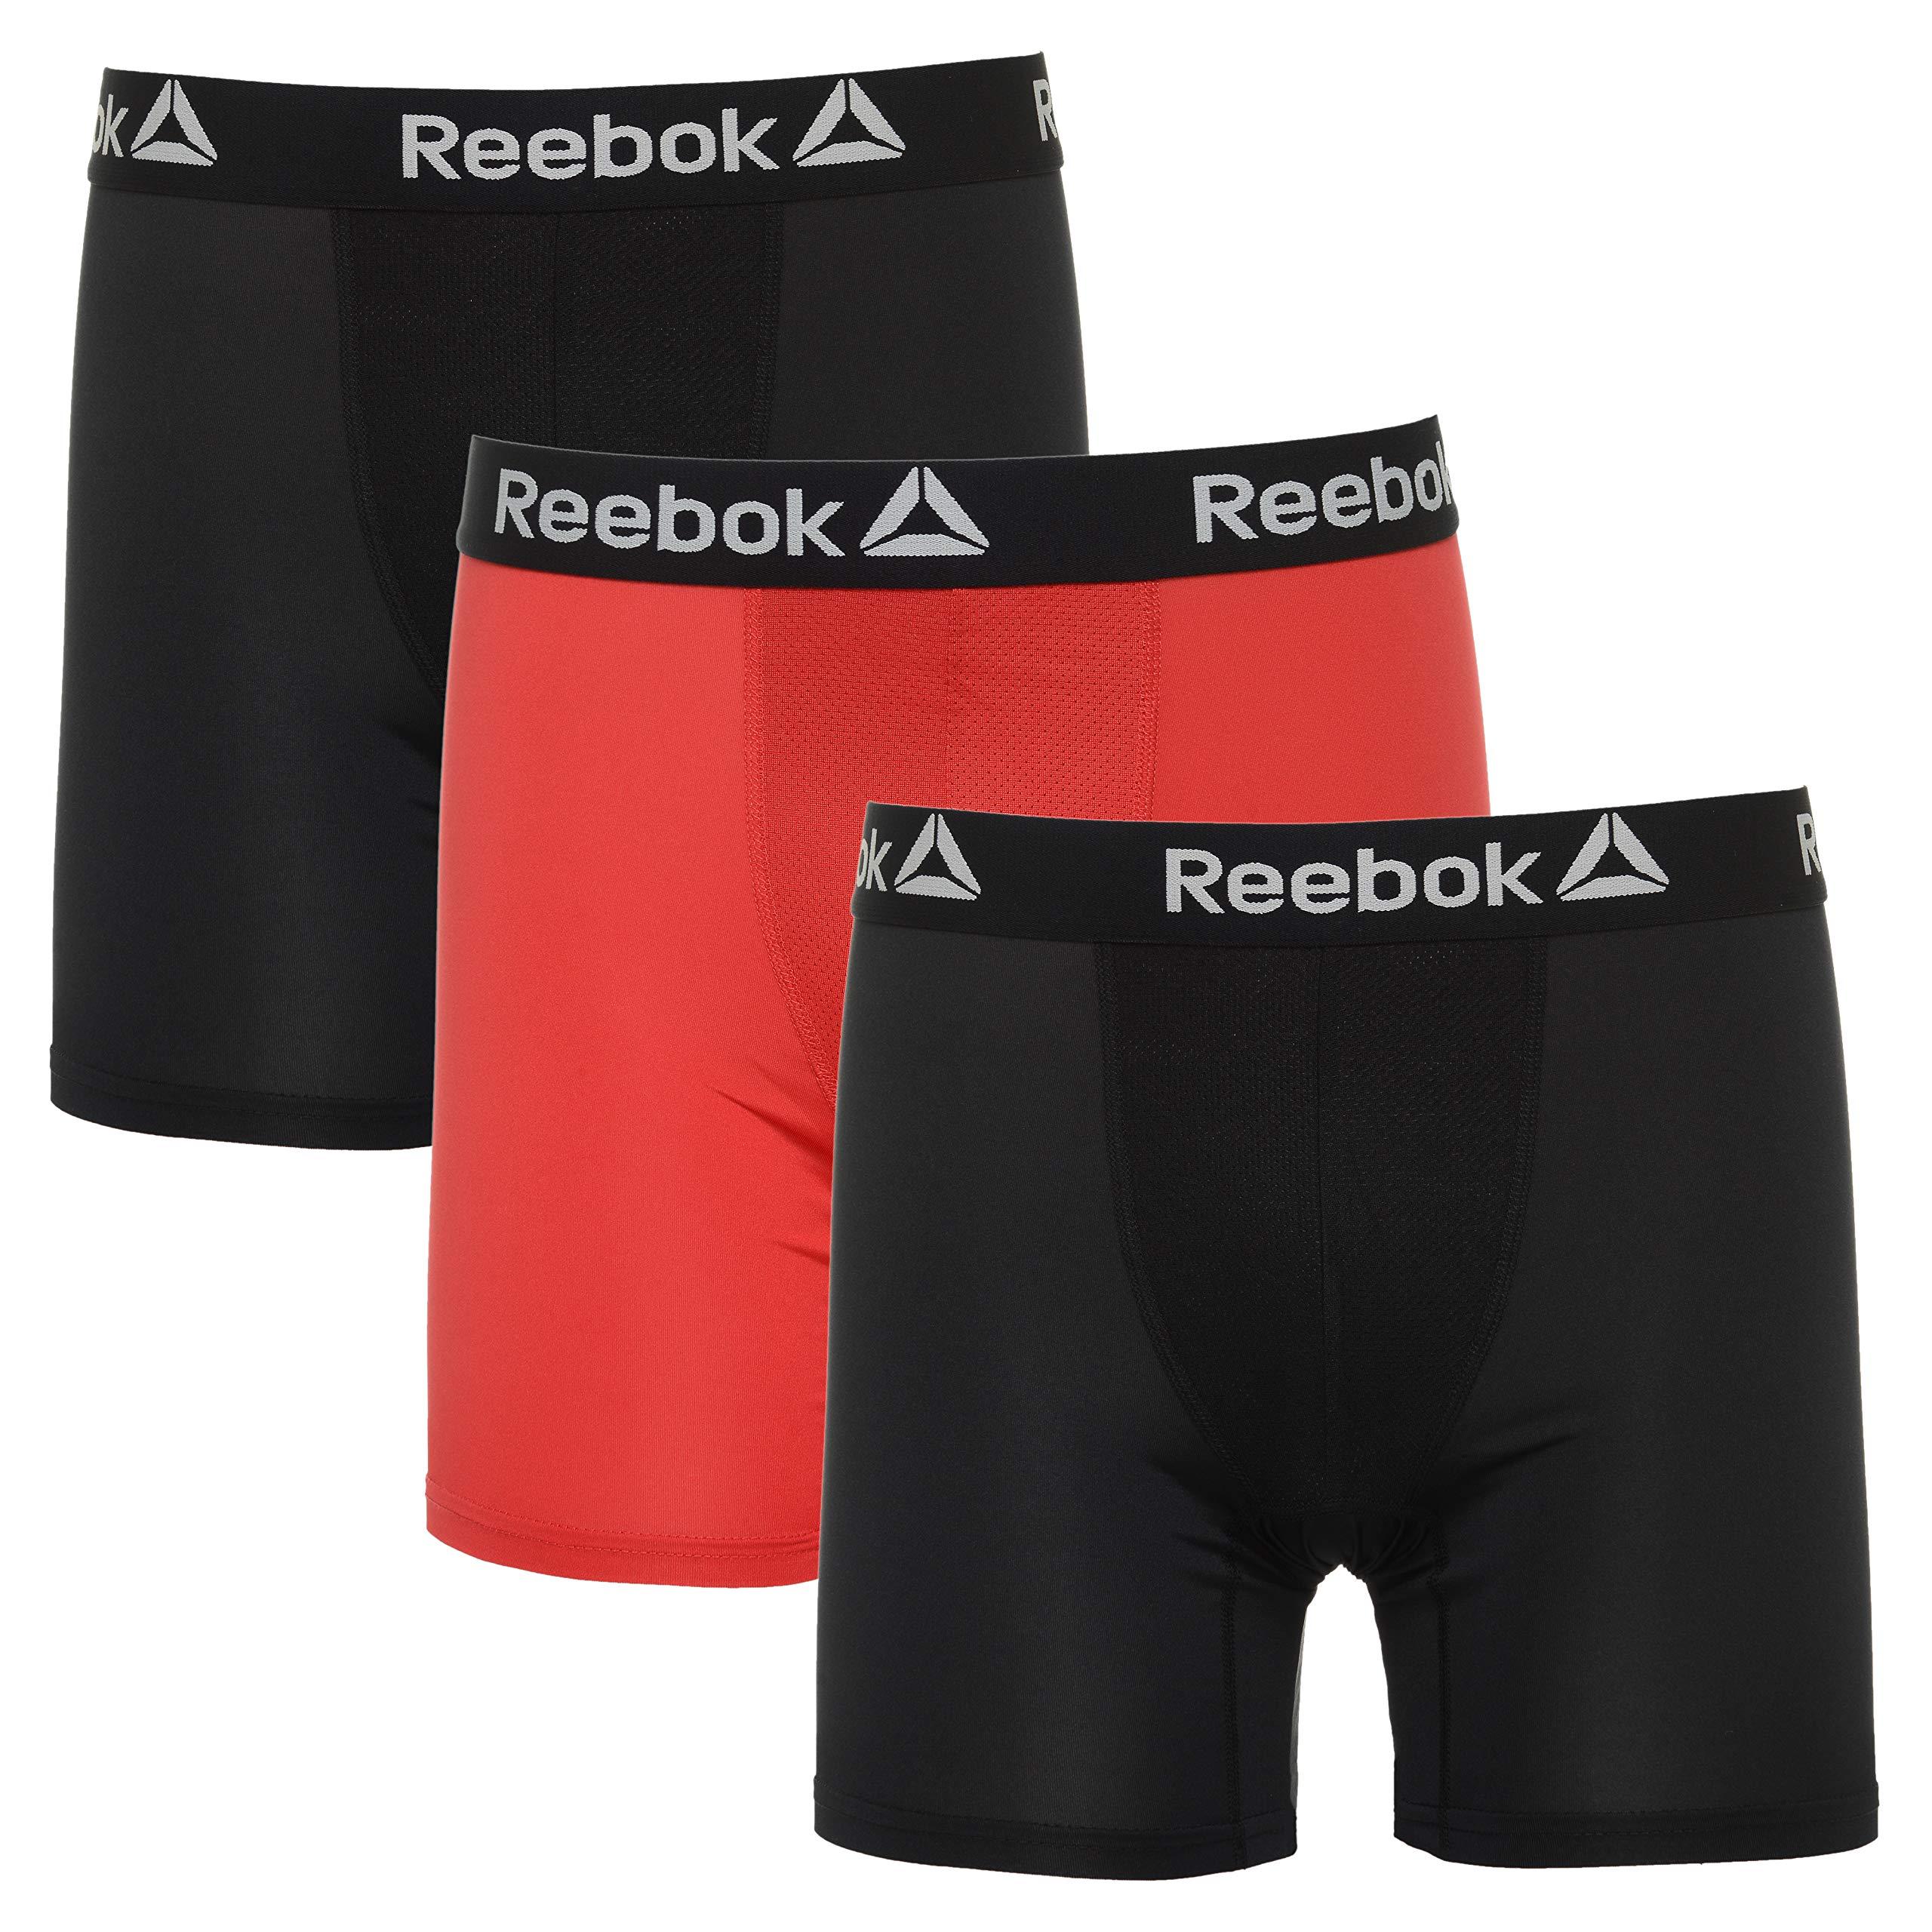 0df707c133 Galleon - Reebok Mens 3 Pack Performance Boxer Briefs Black/Excellent Red/ Black Large